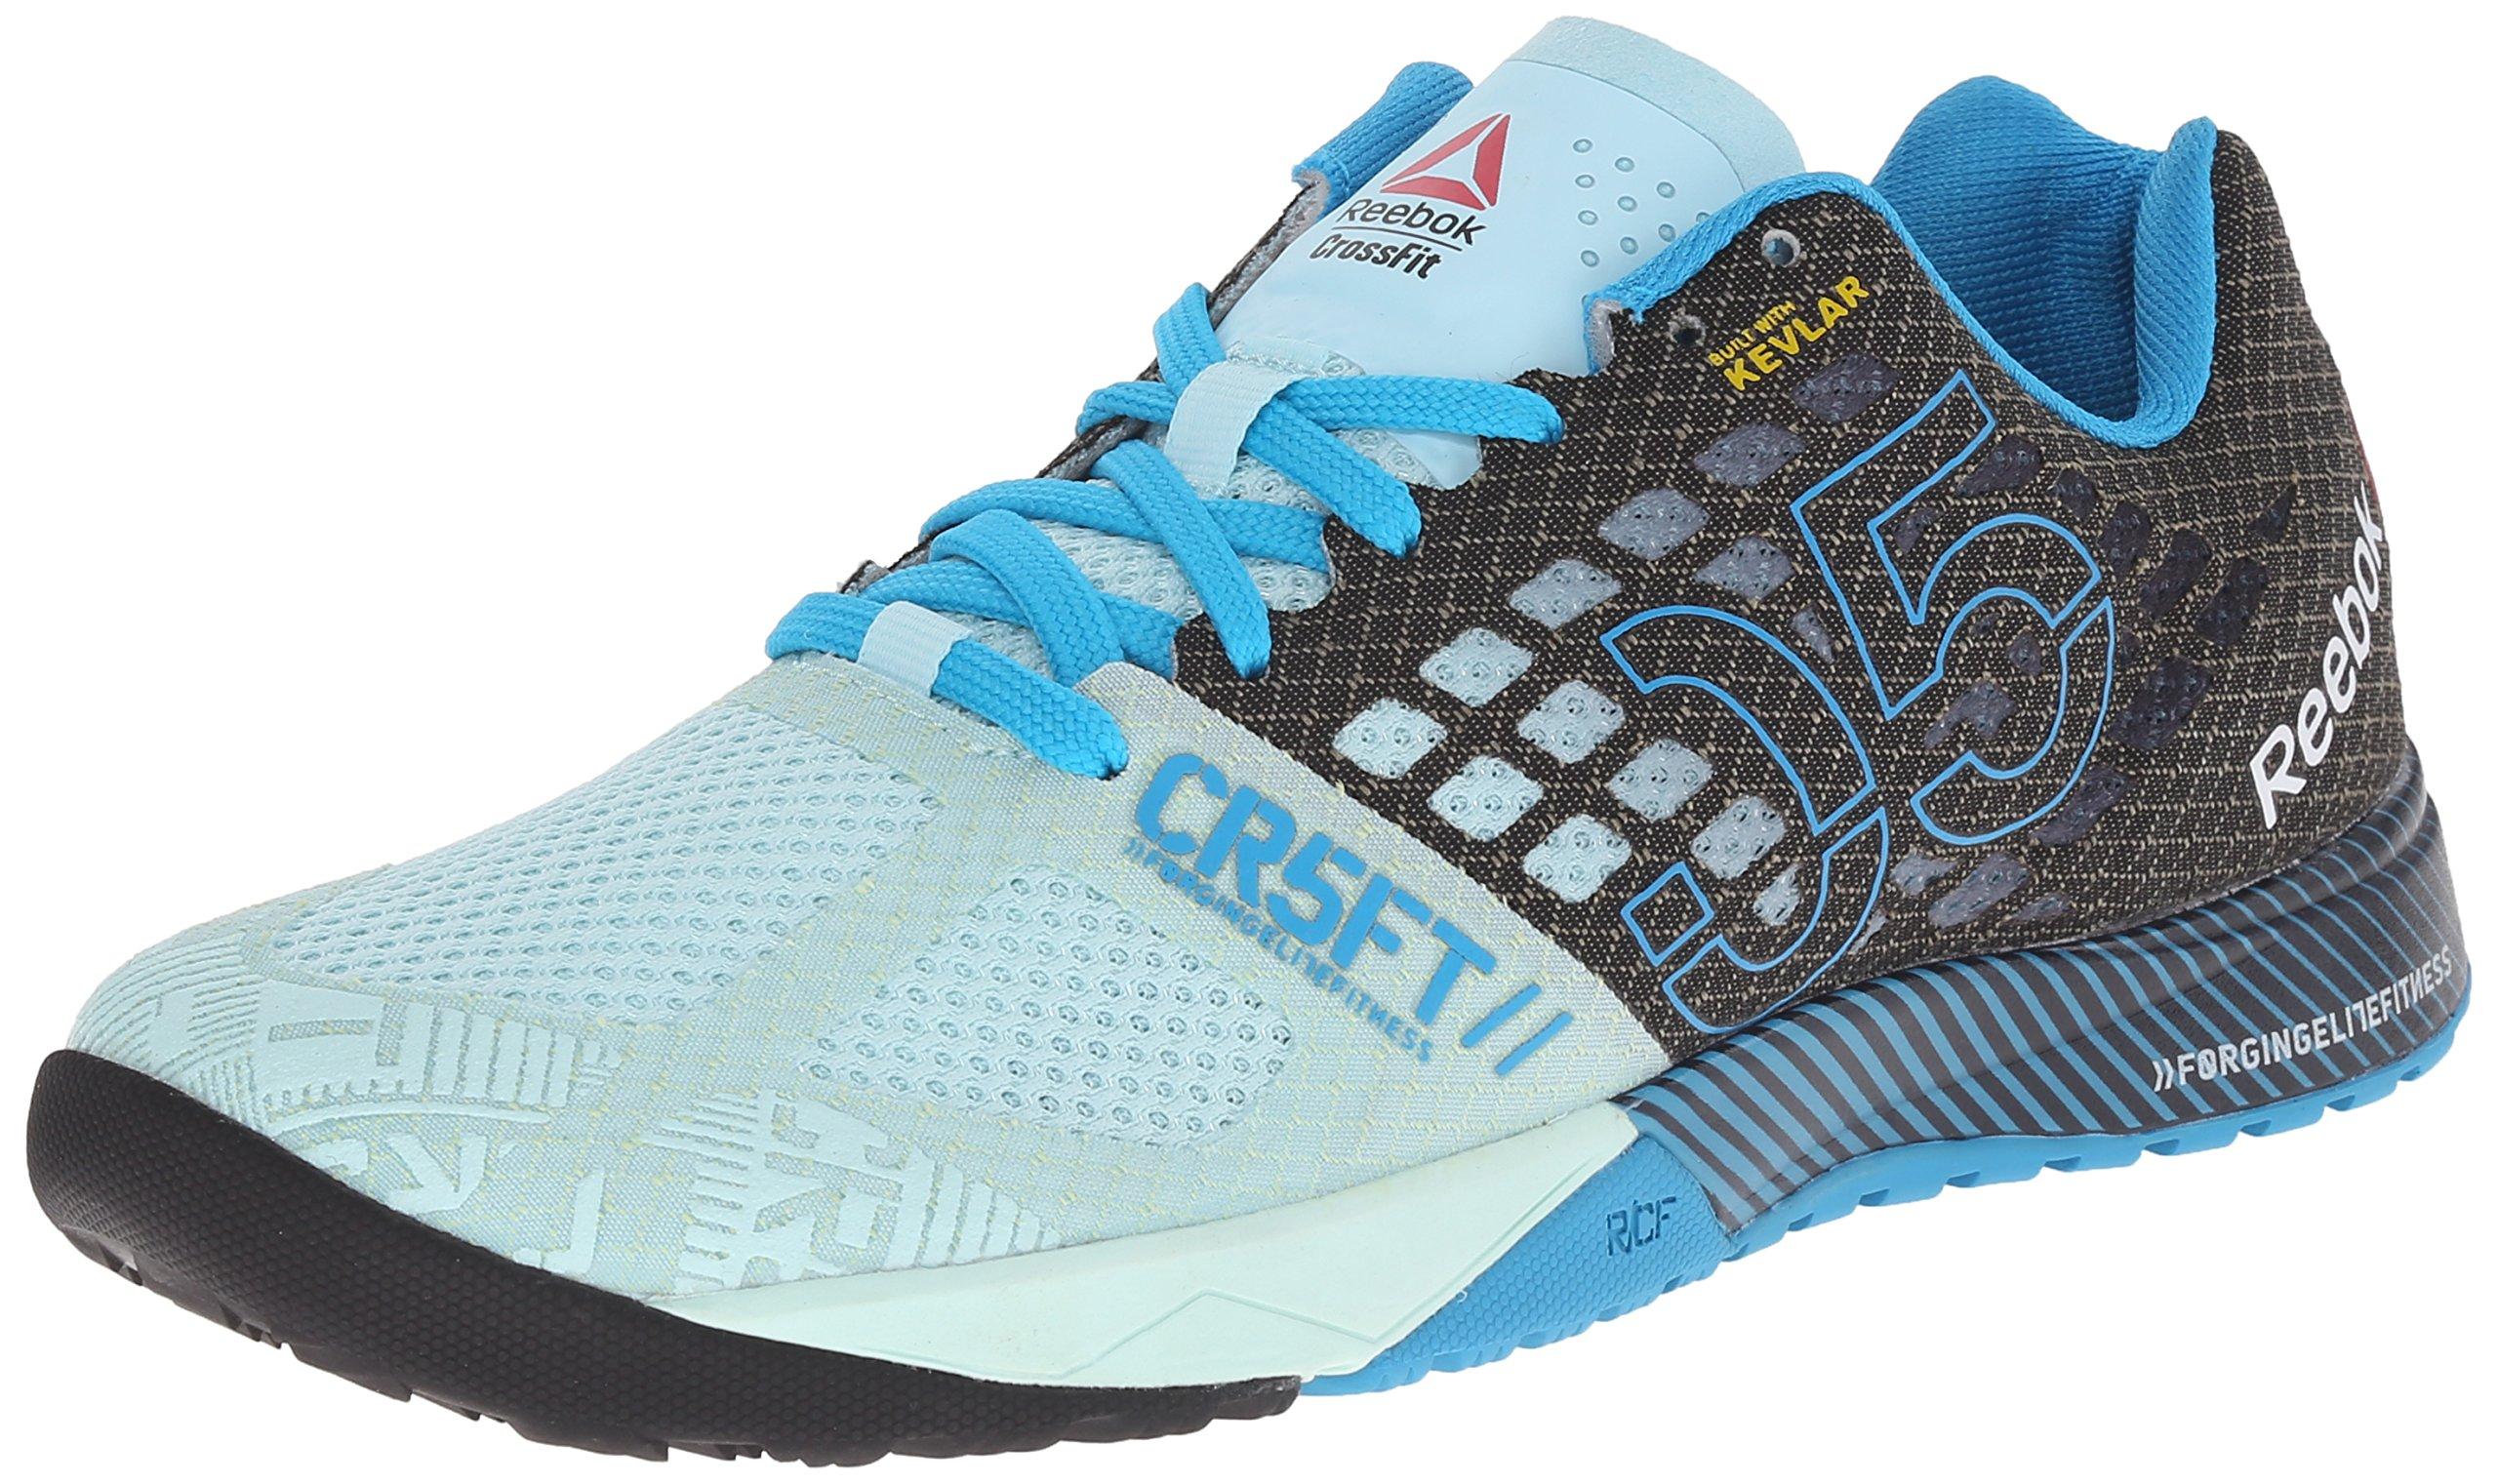 Reebok Women's Crossfit Nano 5.0 Training Shoe, Cool Breeze/Black/Far Out Blue, 5 M US